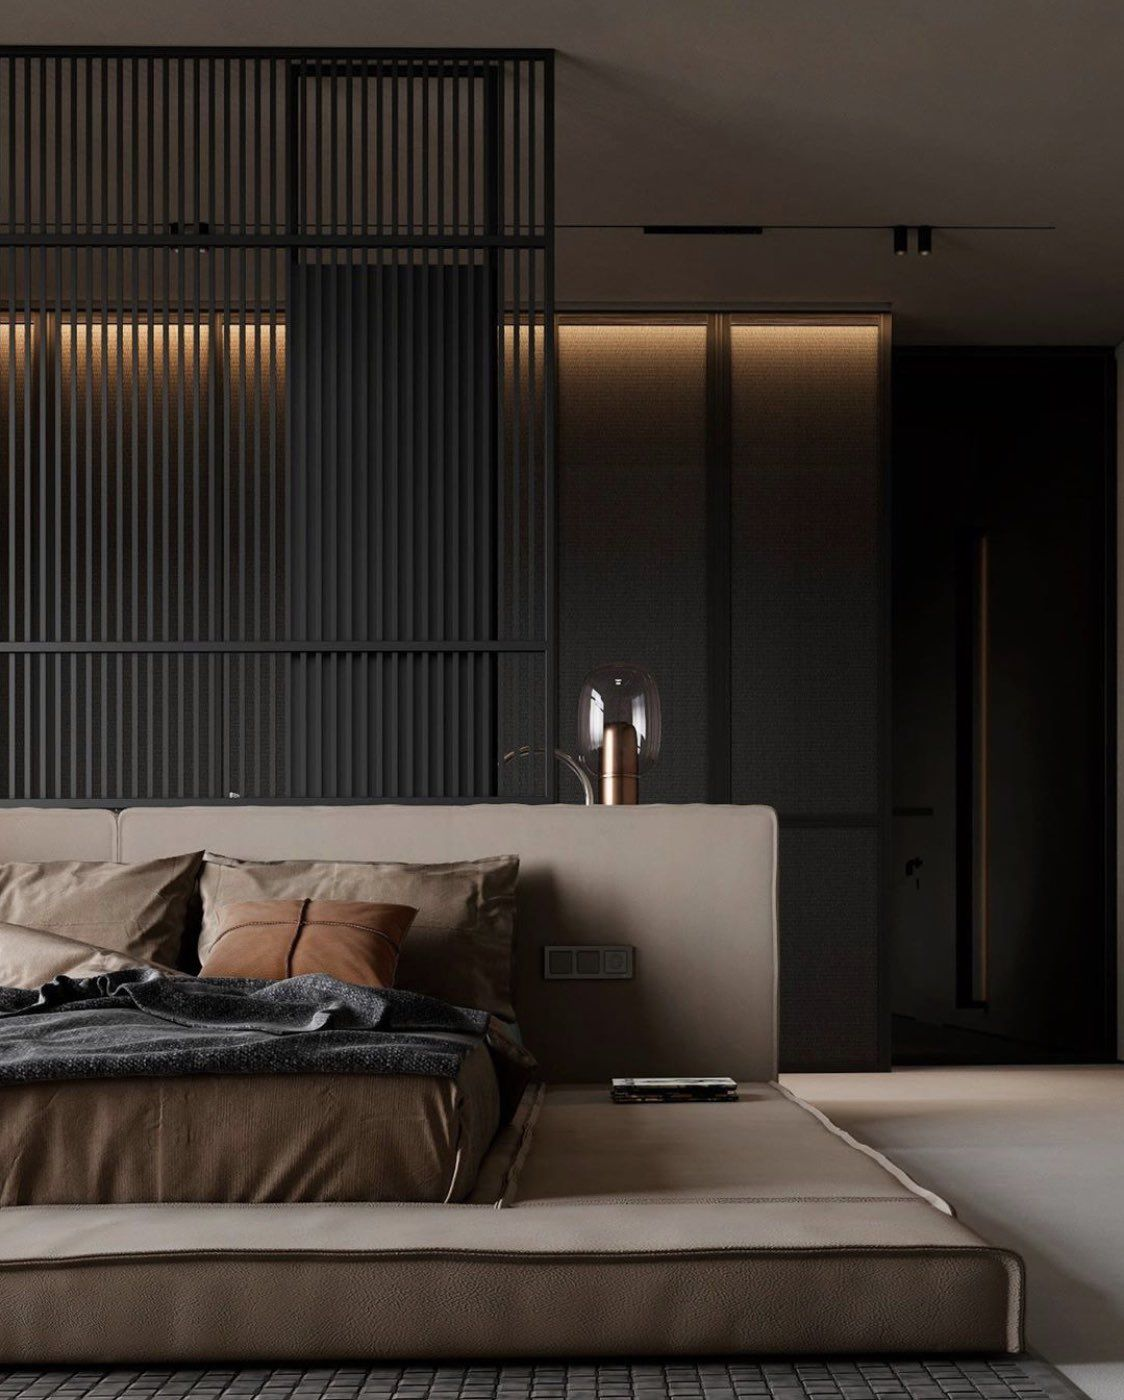 ꨄ On Twitter Hotel Room Design Luxury Hotel Room Master Bedroom Interior